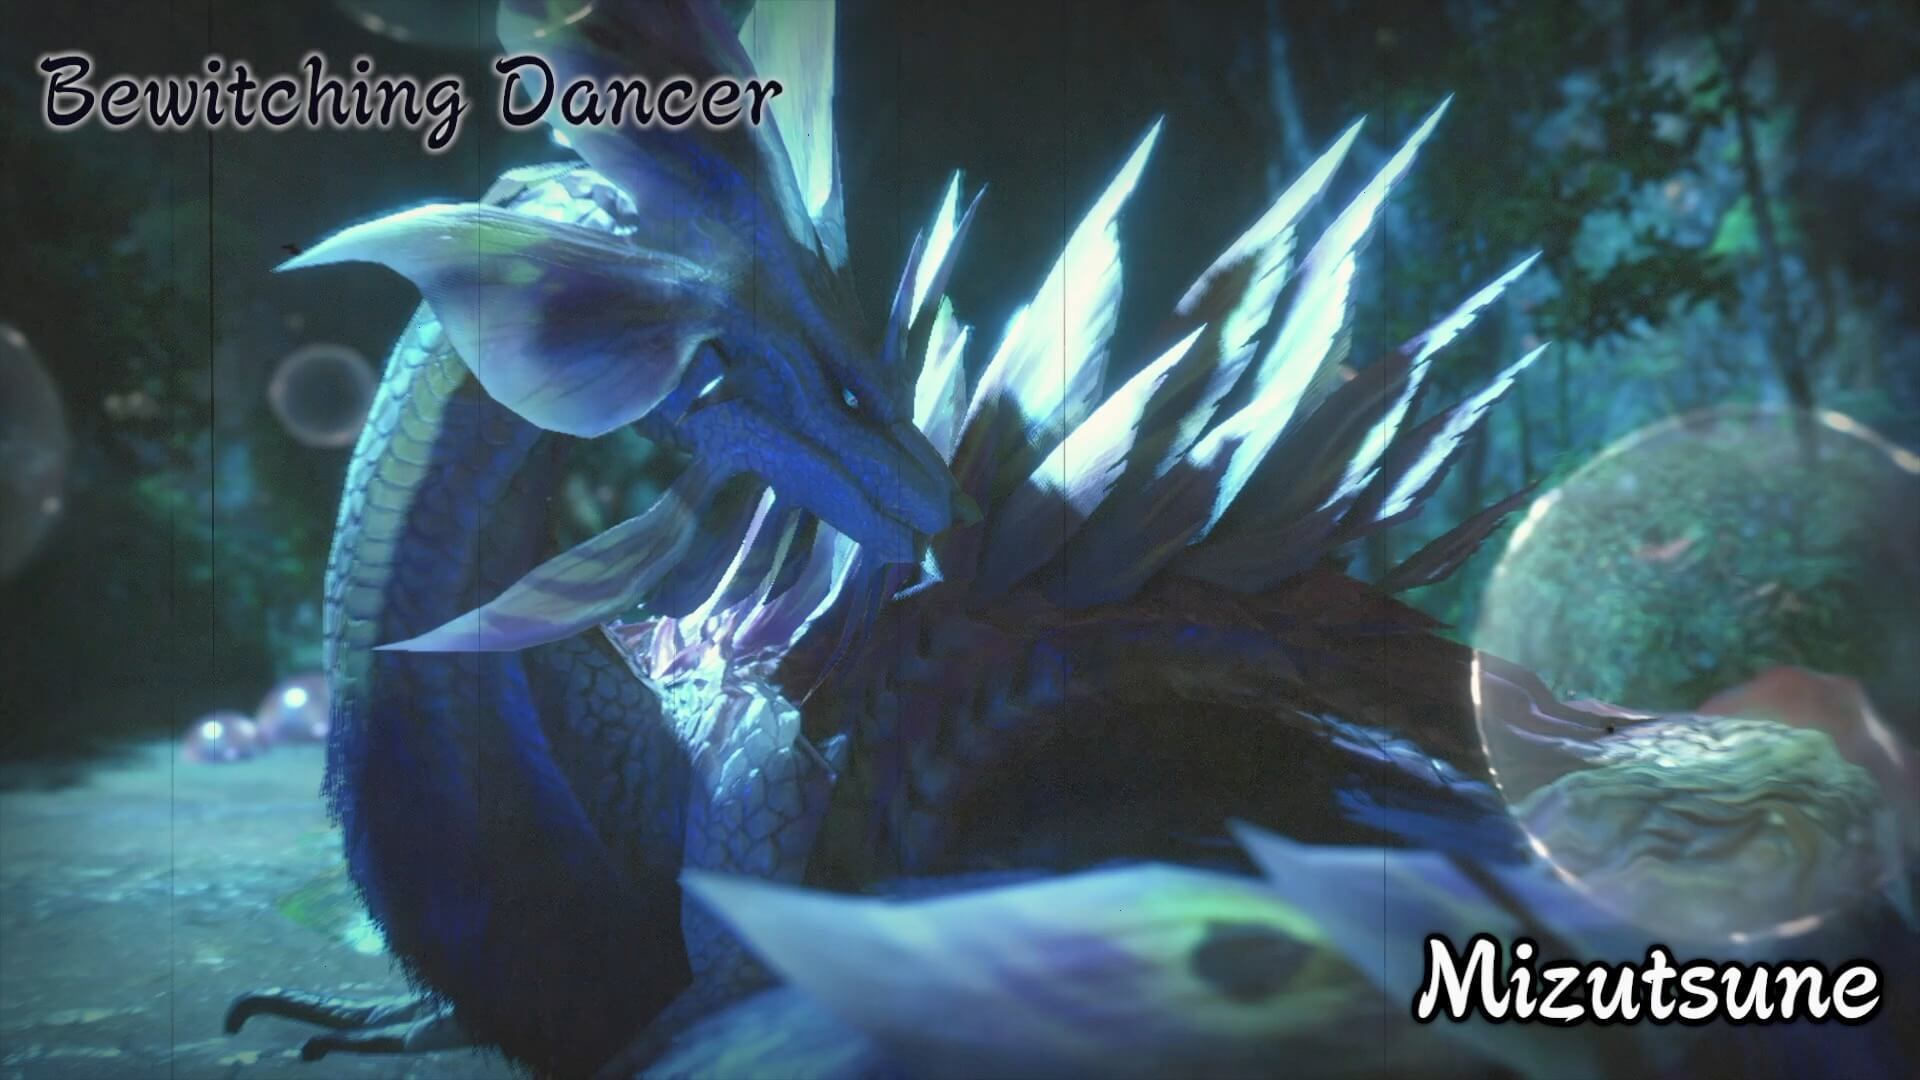 Bewitching Dancer